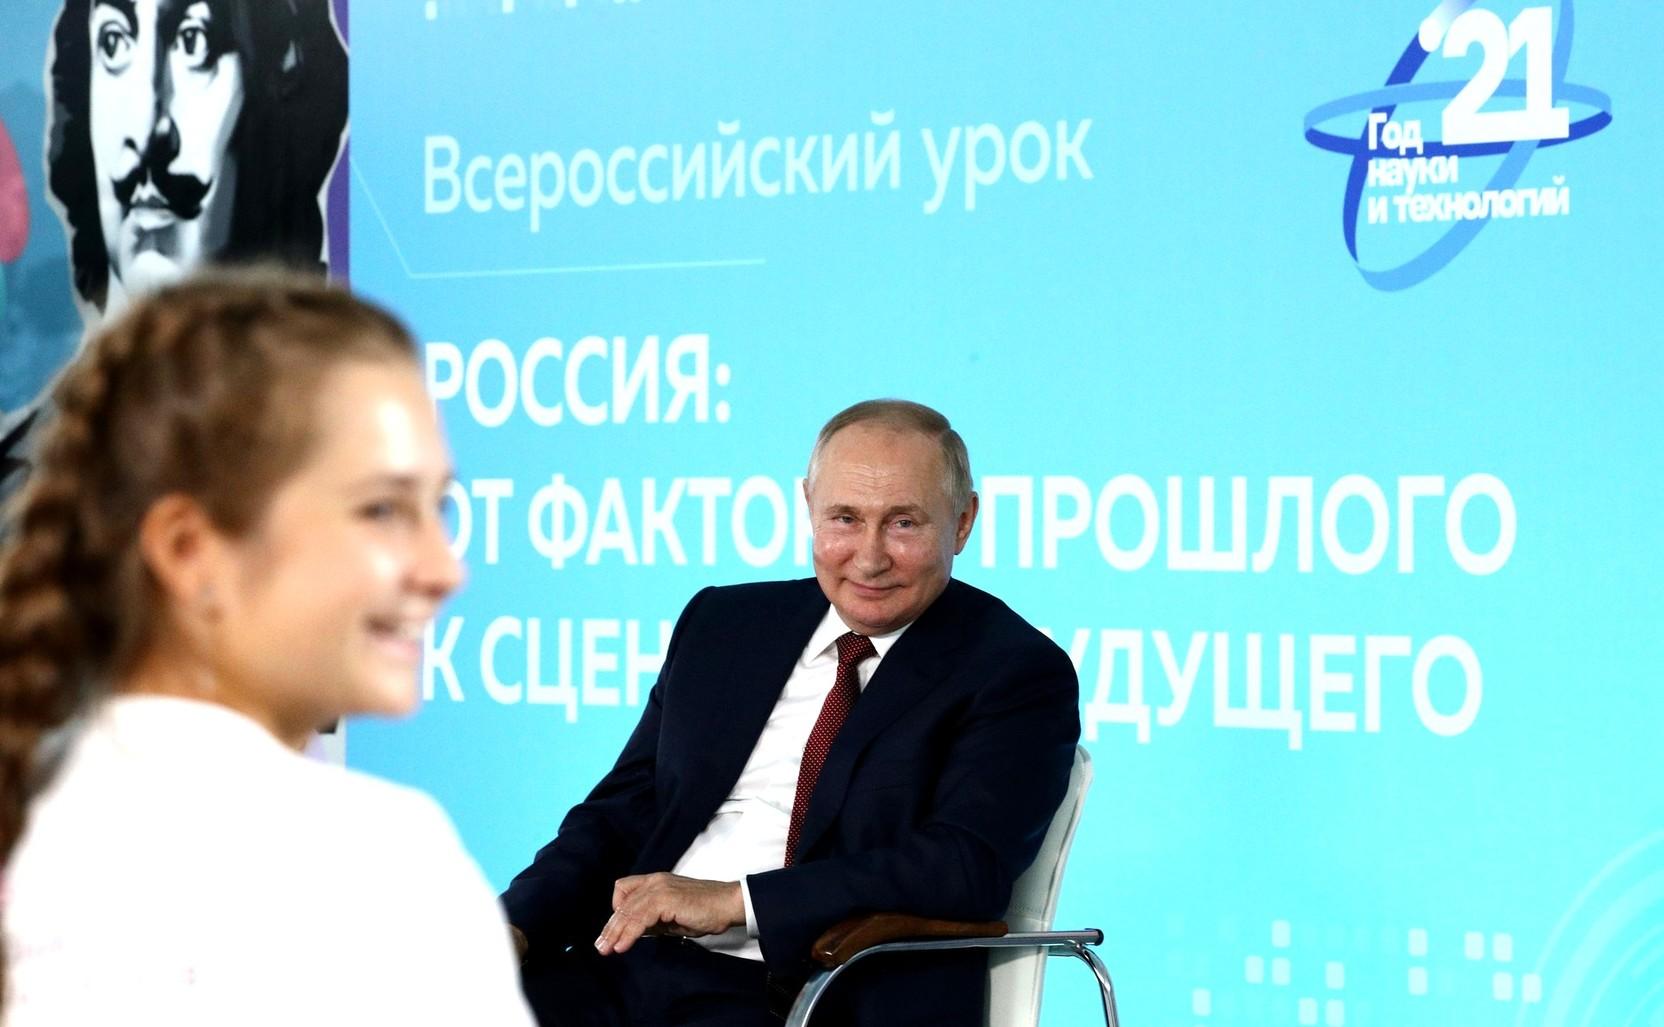 Врач поддержал уход Путина на самоизоляцию